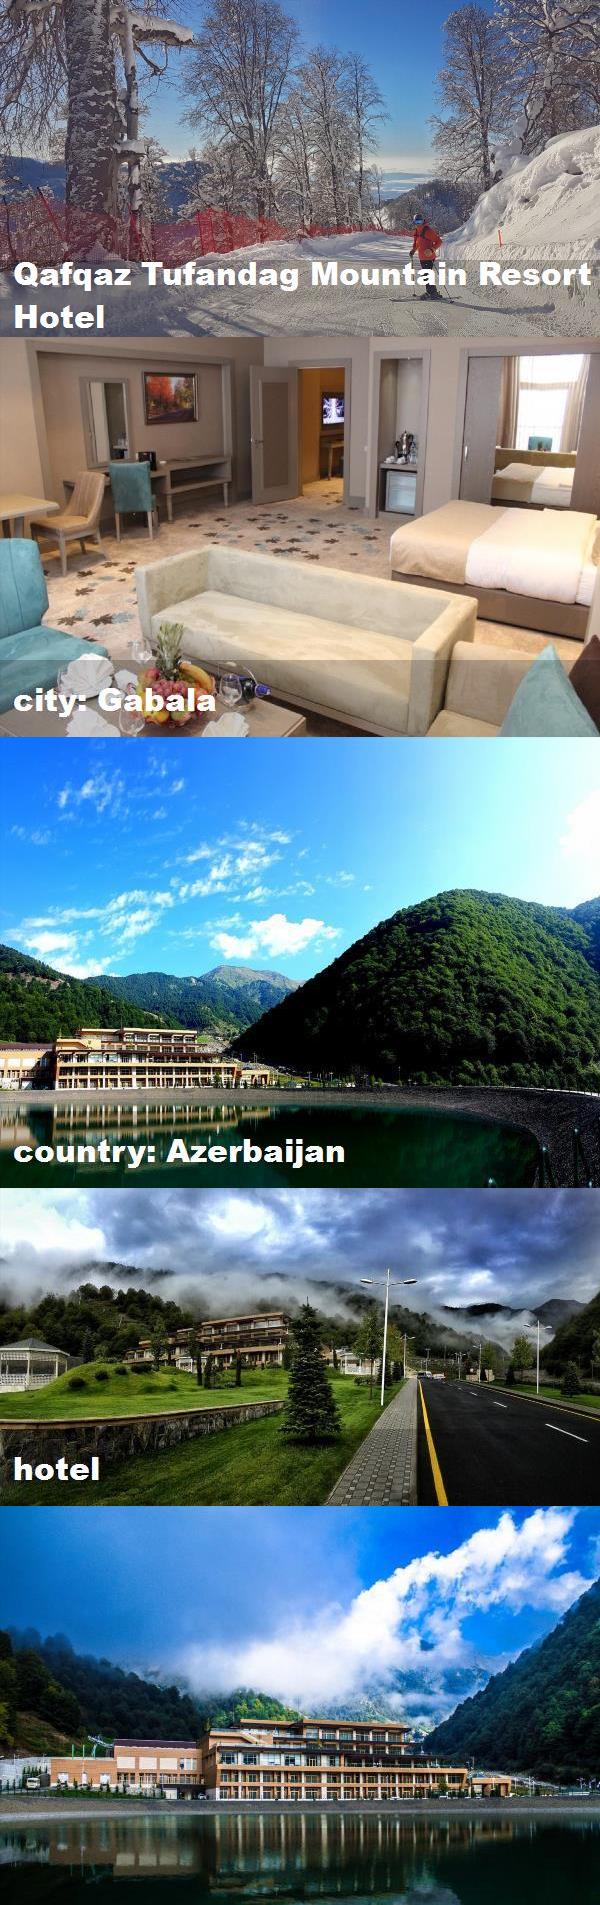 Qafqaz Tufandag Mountain Resort Hotel City Gabala Country Azerbaijan Hotel Hotel Hotels And Resorts Mountain Resort